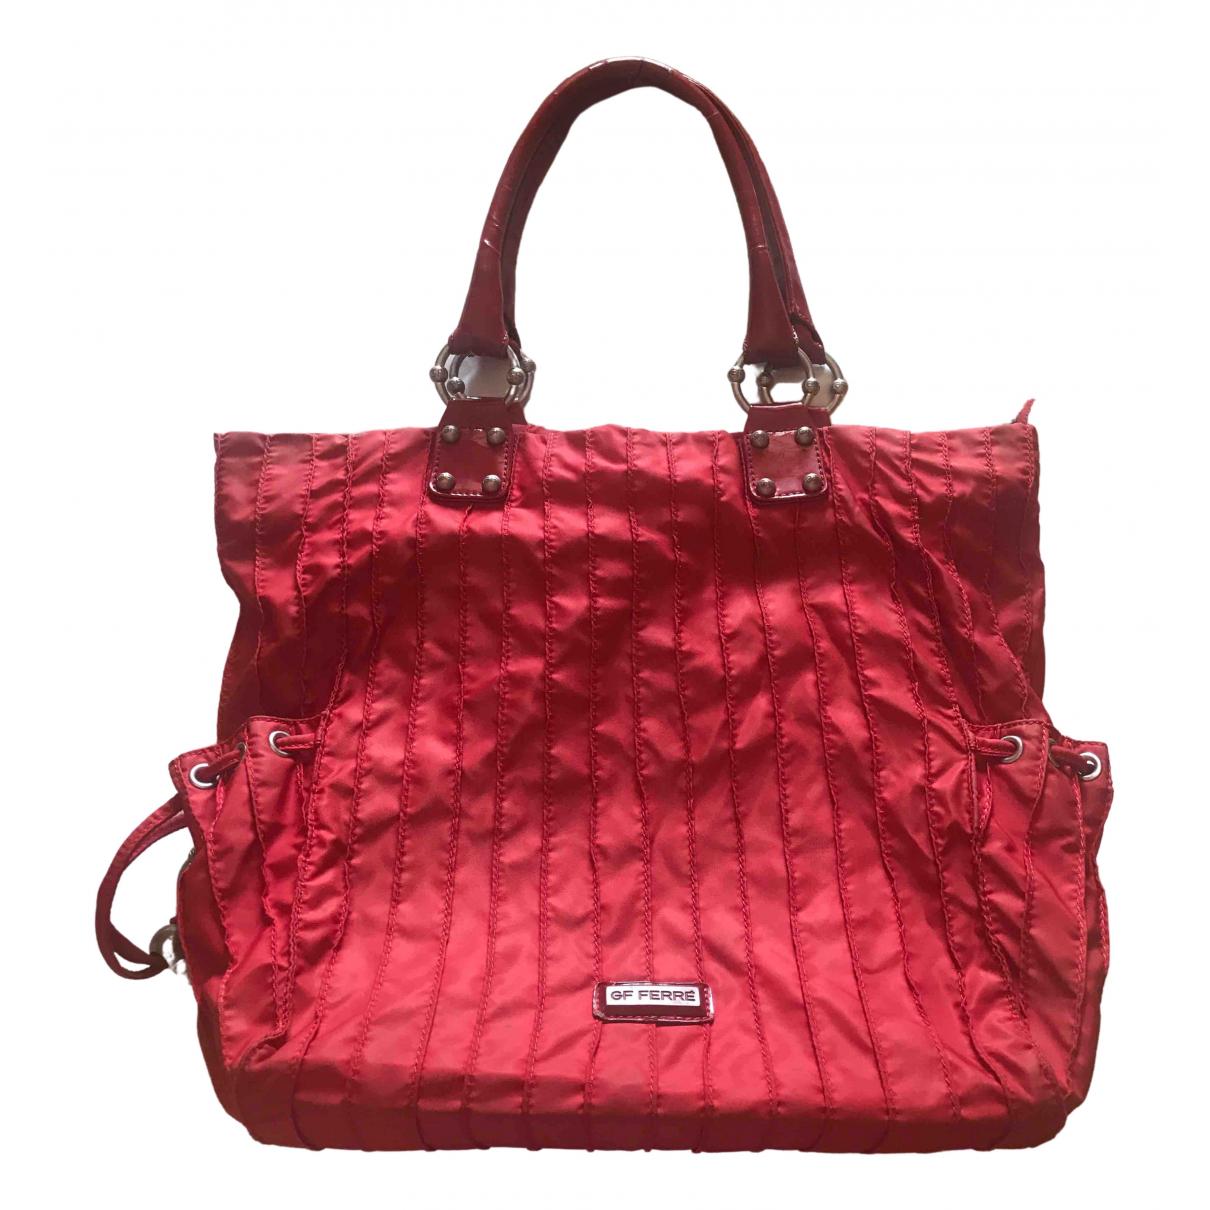 Gianfranco Ferré \N Red Cloth handbag for Women \N